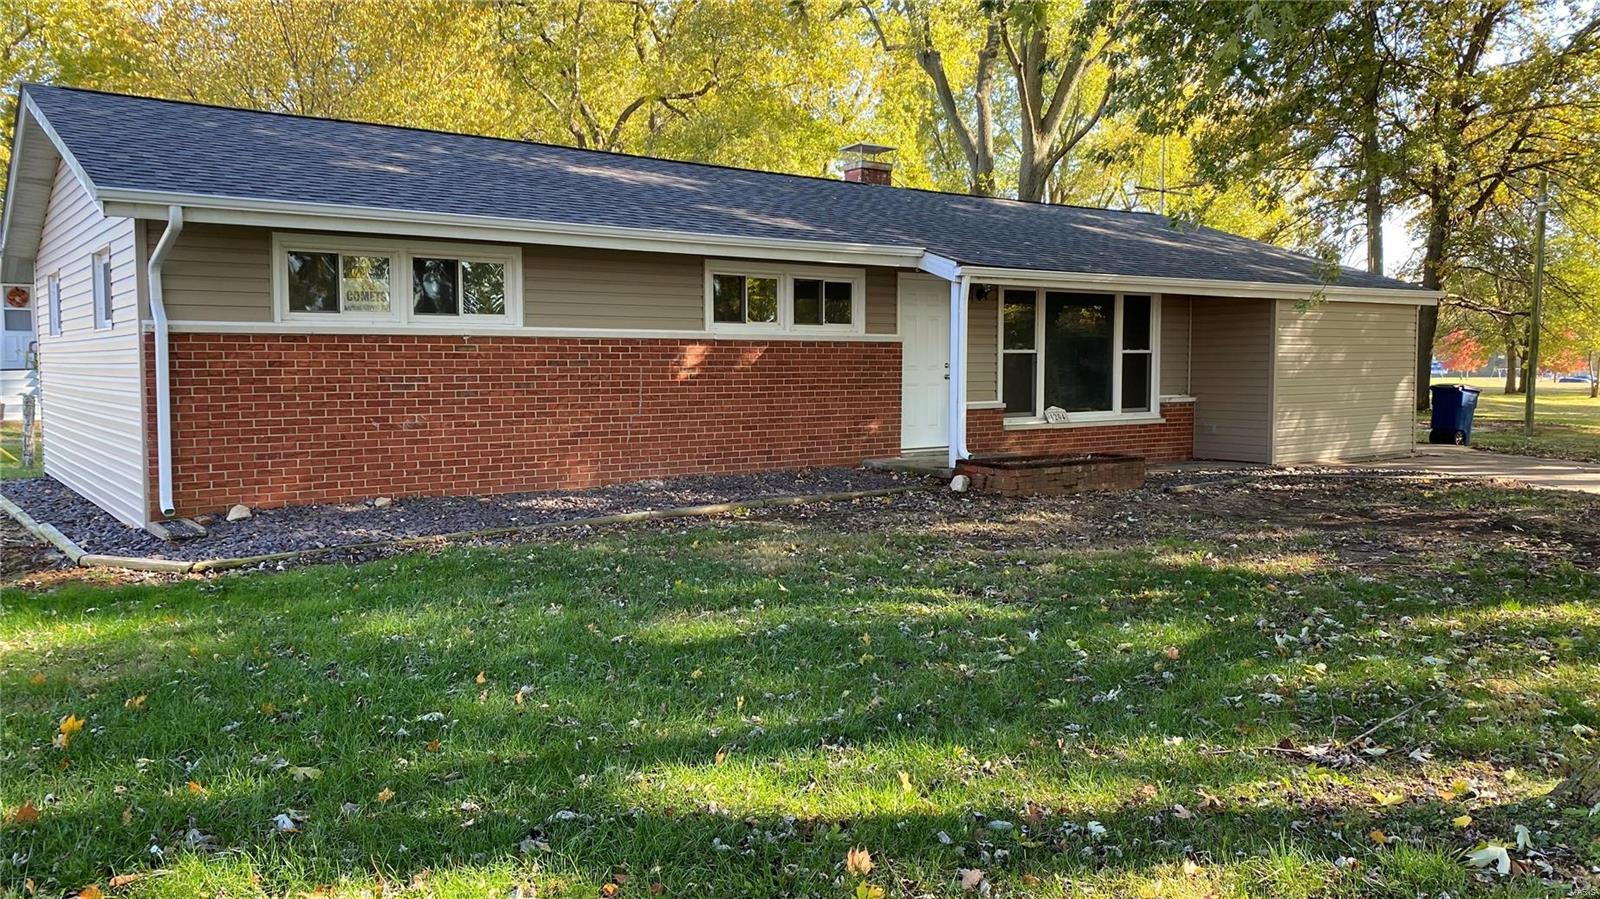 1204 Il Rt. 140 Property Photo - Greenville, IL real estate listing